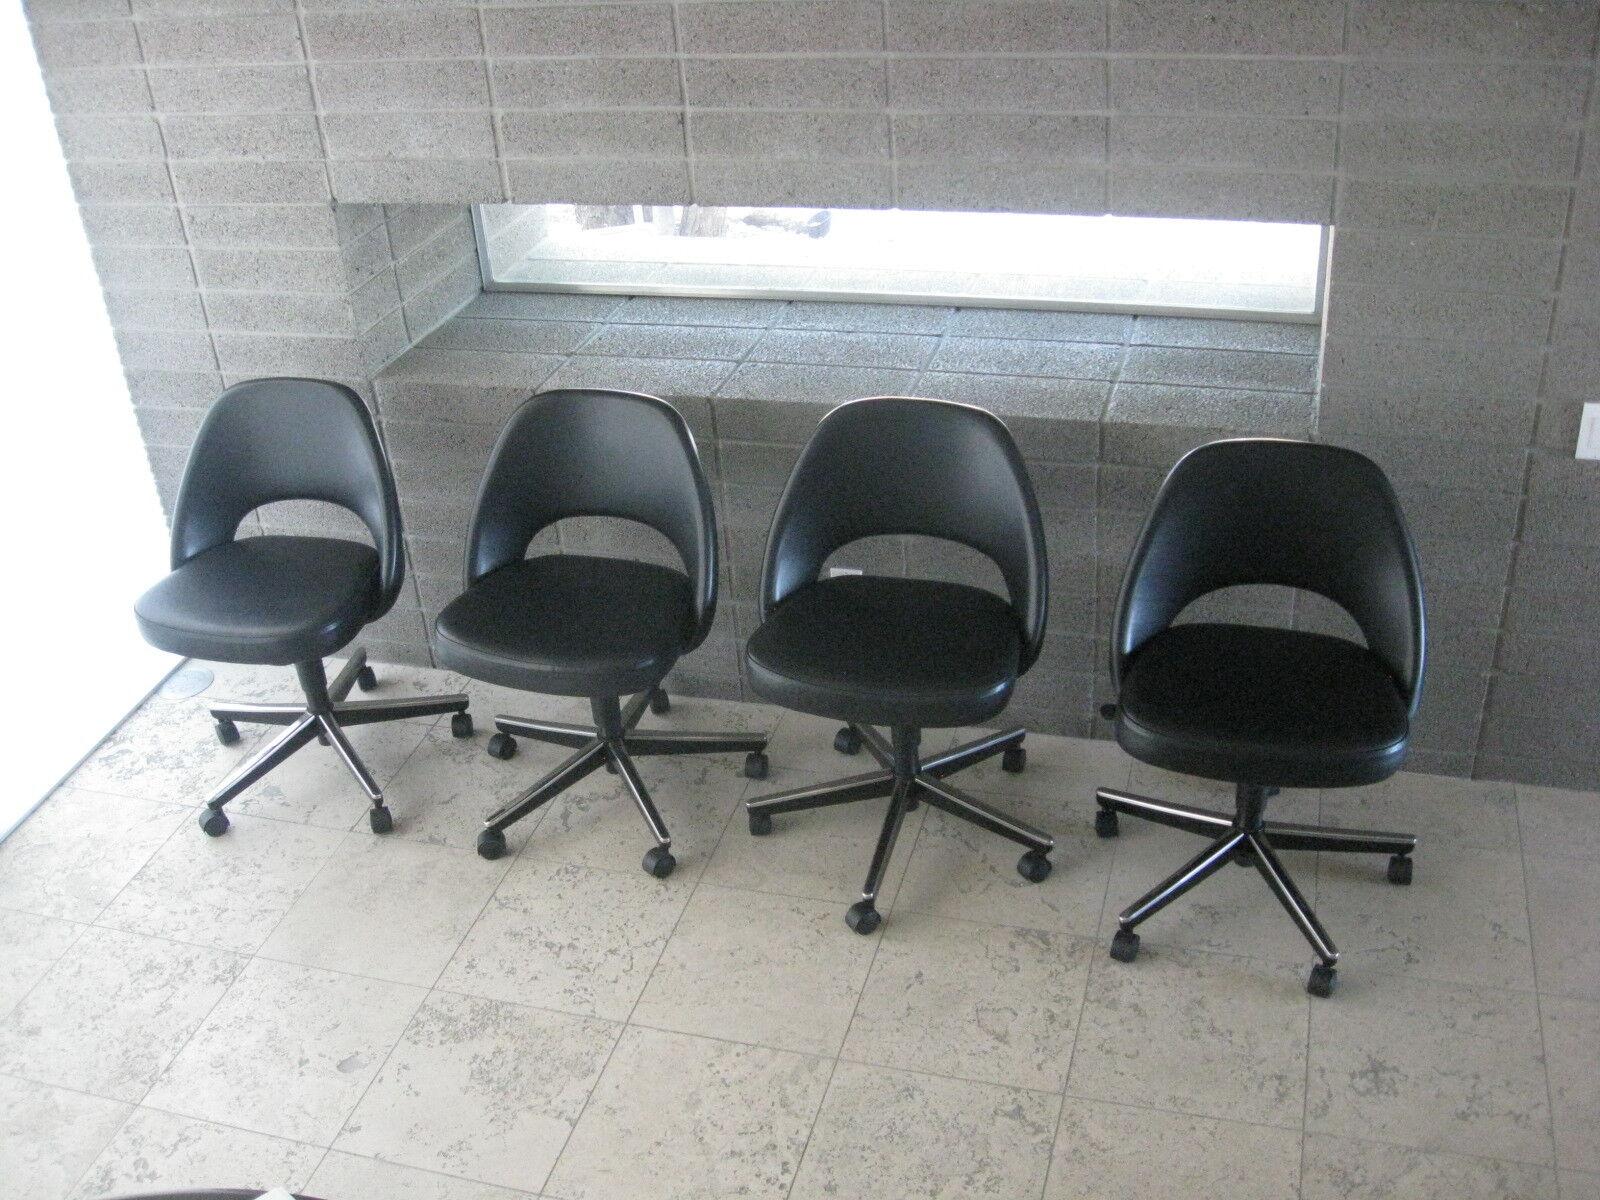 Knoll 4 Saarinen Executive Armless Chairs Barcelona Eames Mies Van Der Rohe